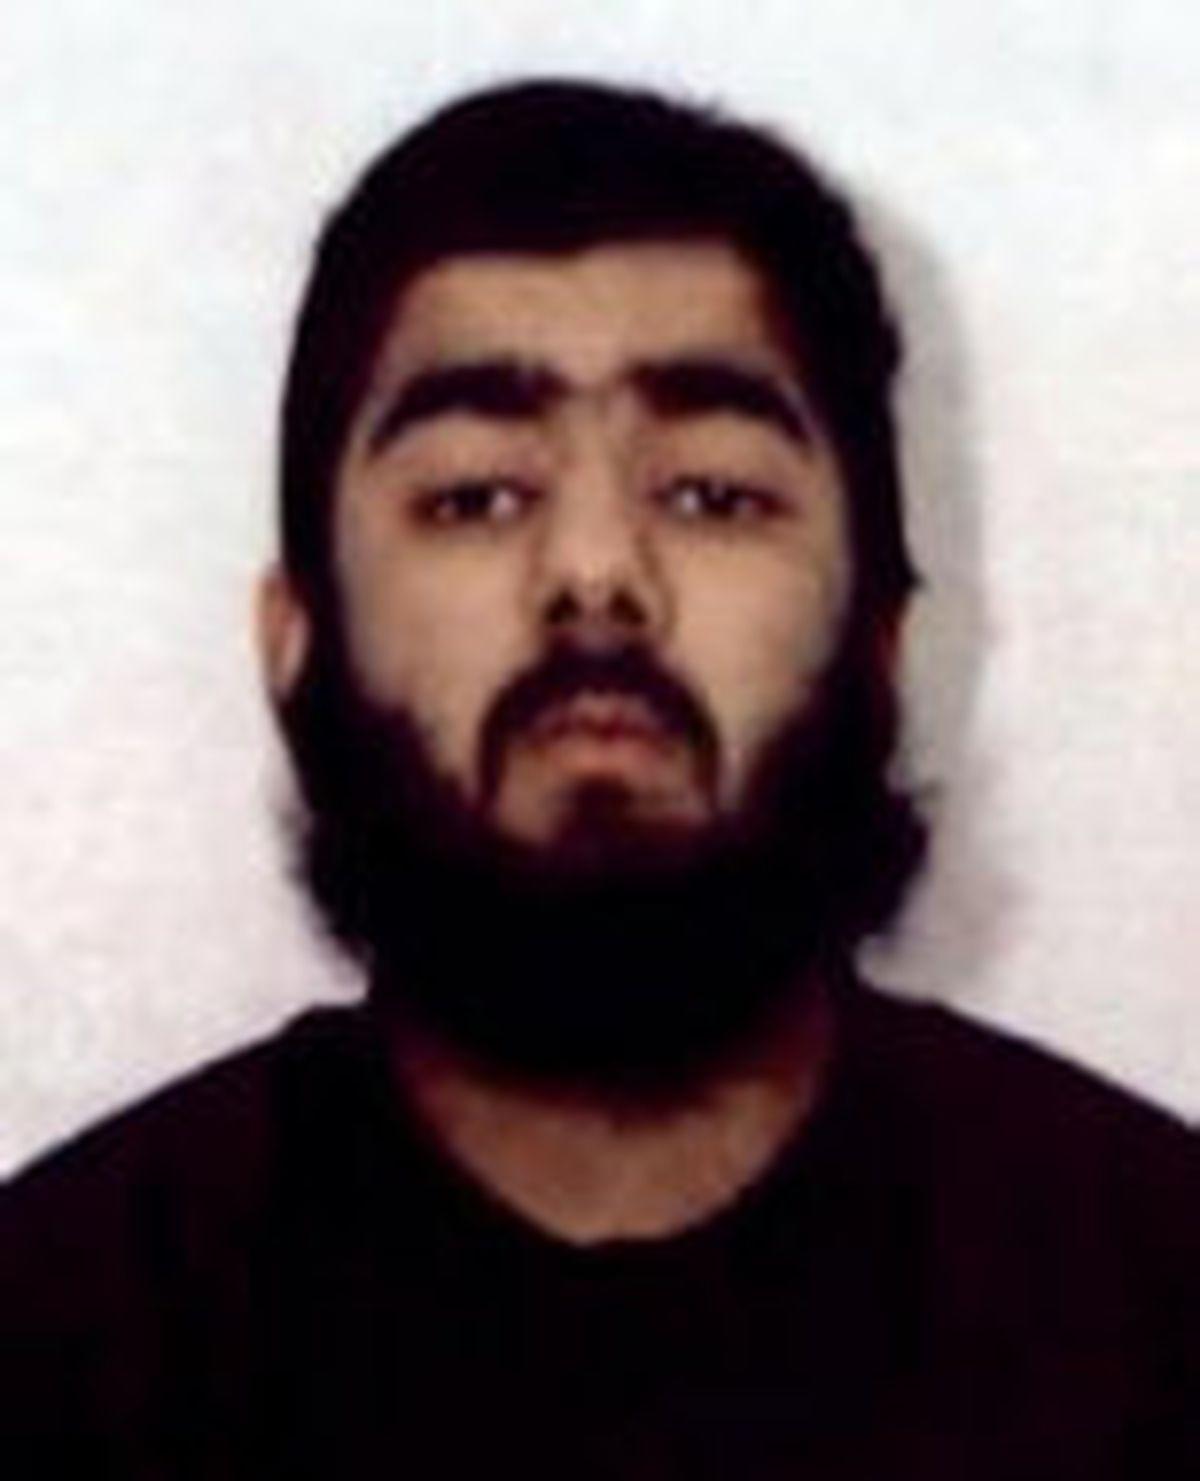 Usman Khan aged 20